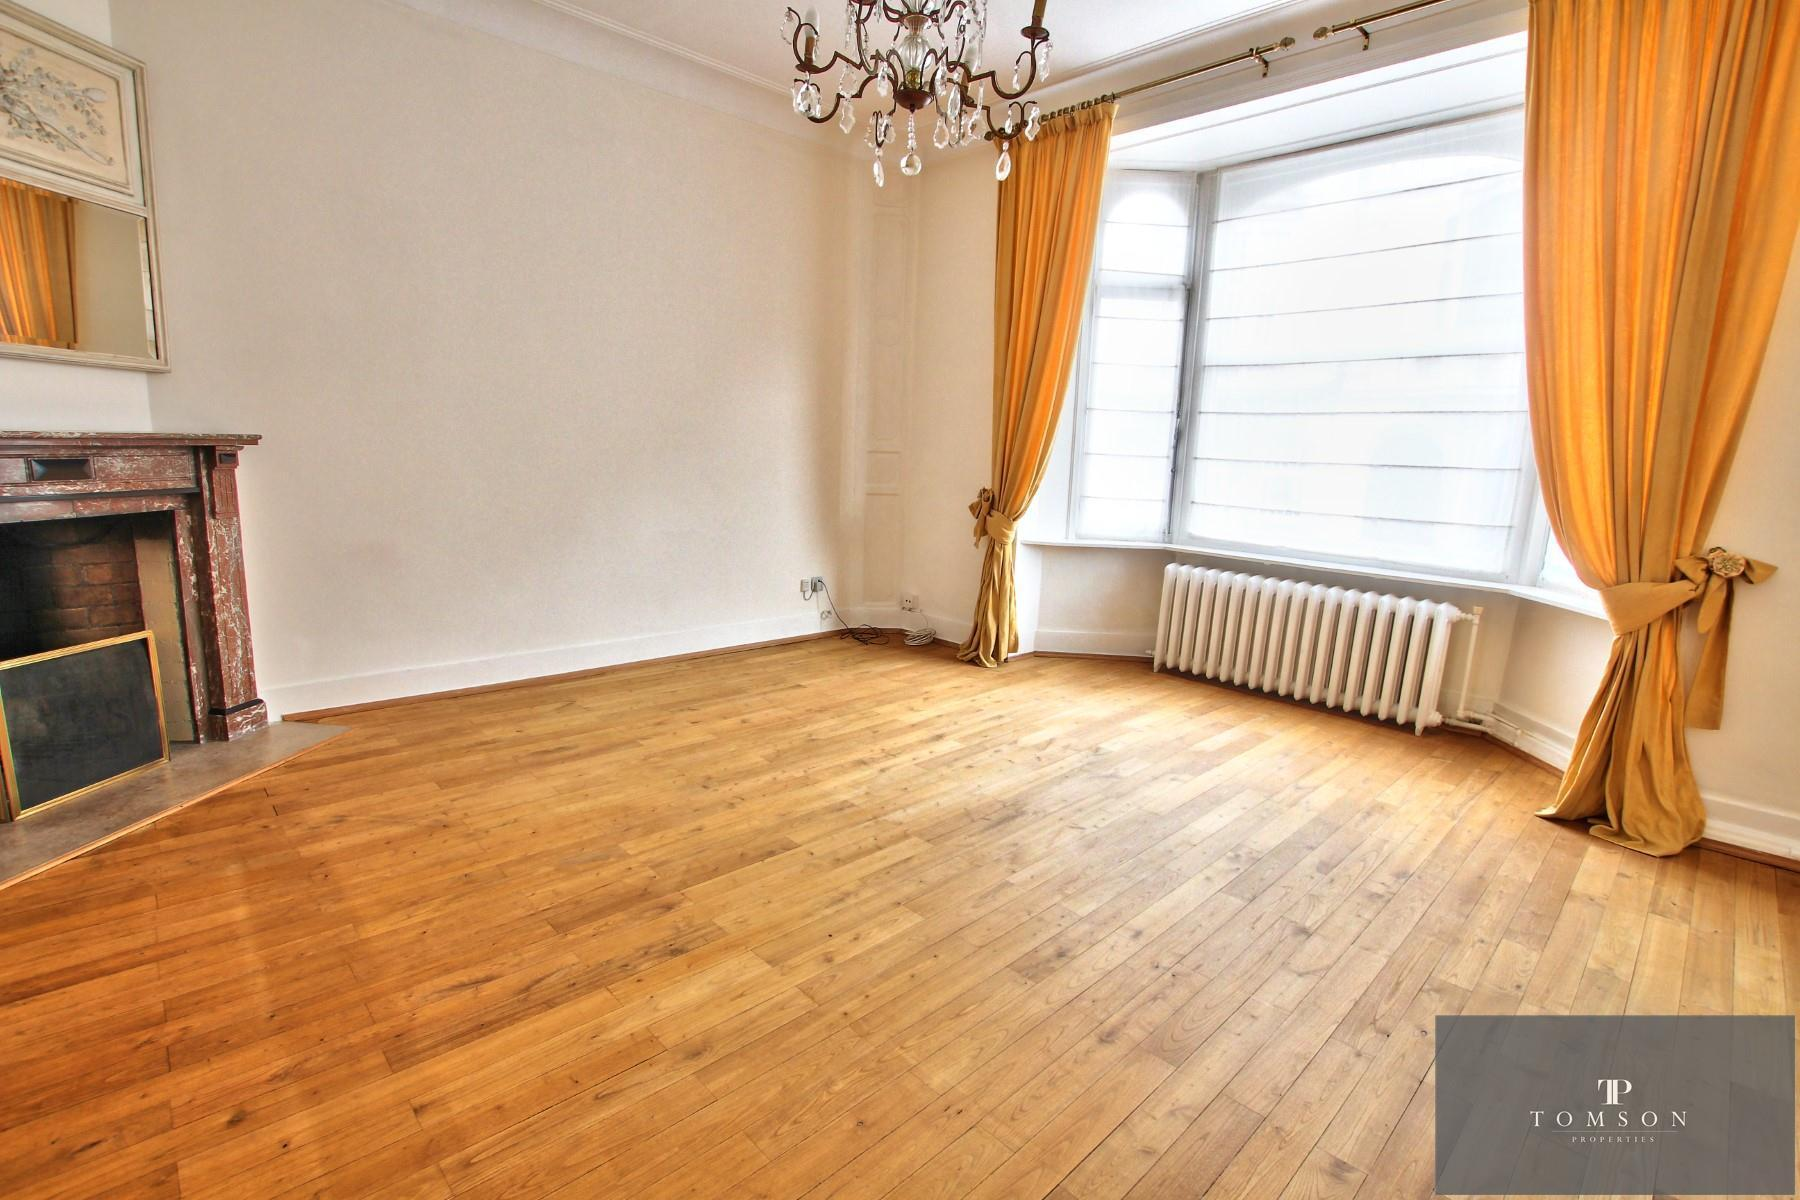 House - Etterbeek - #4246787-2